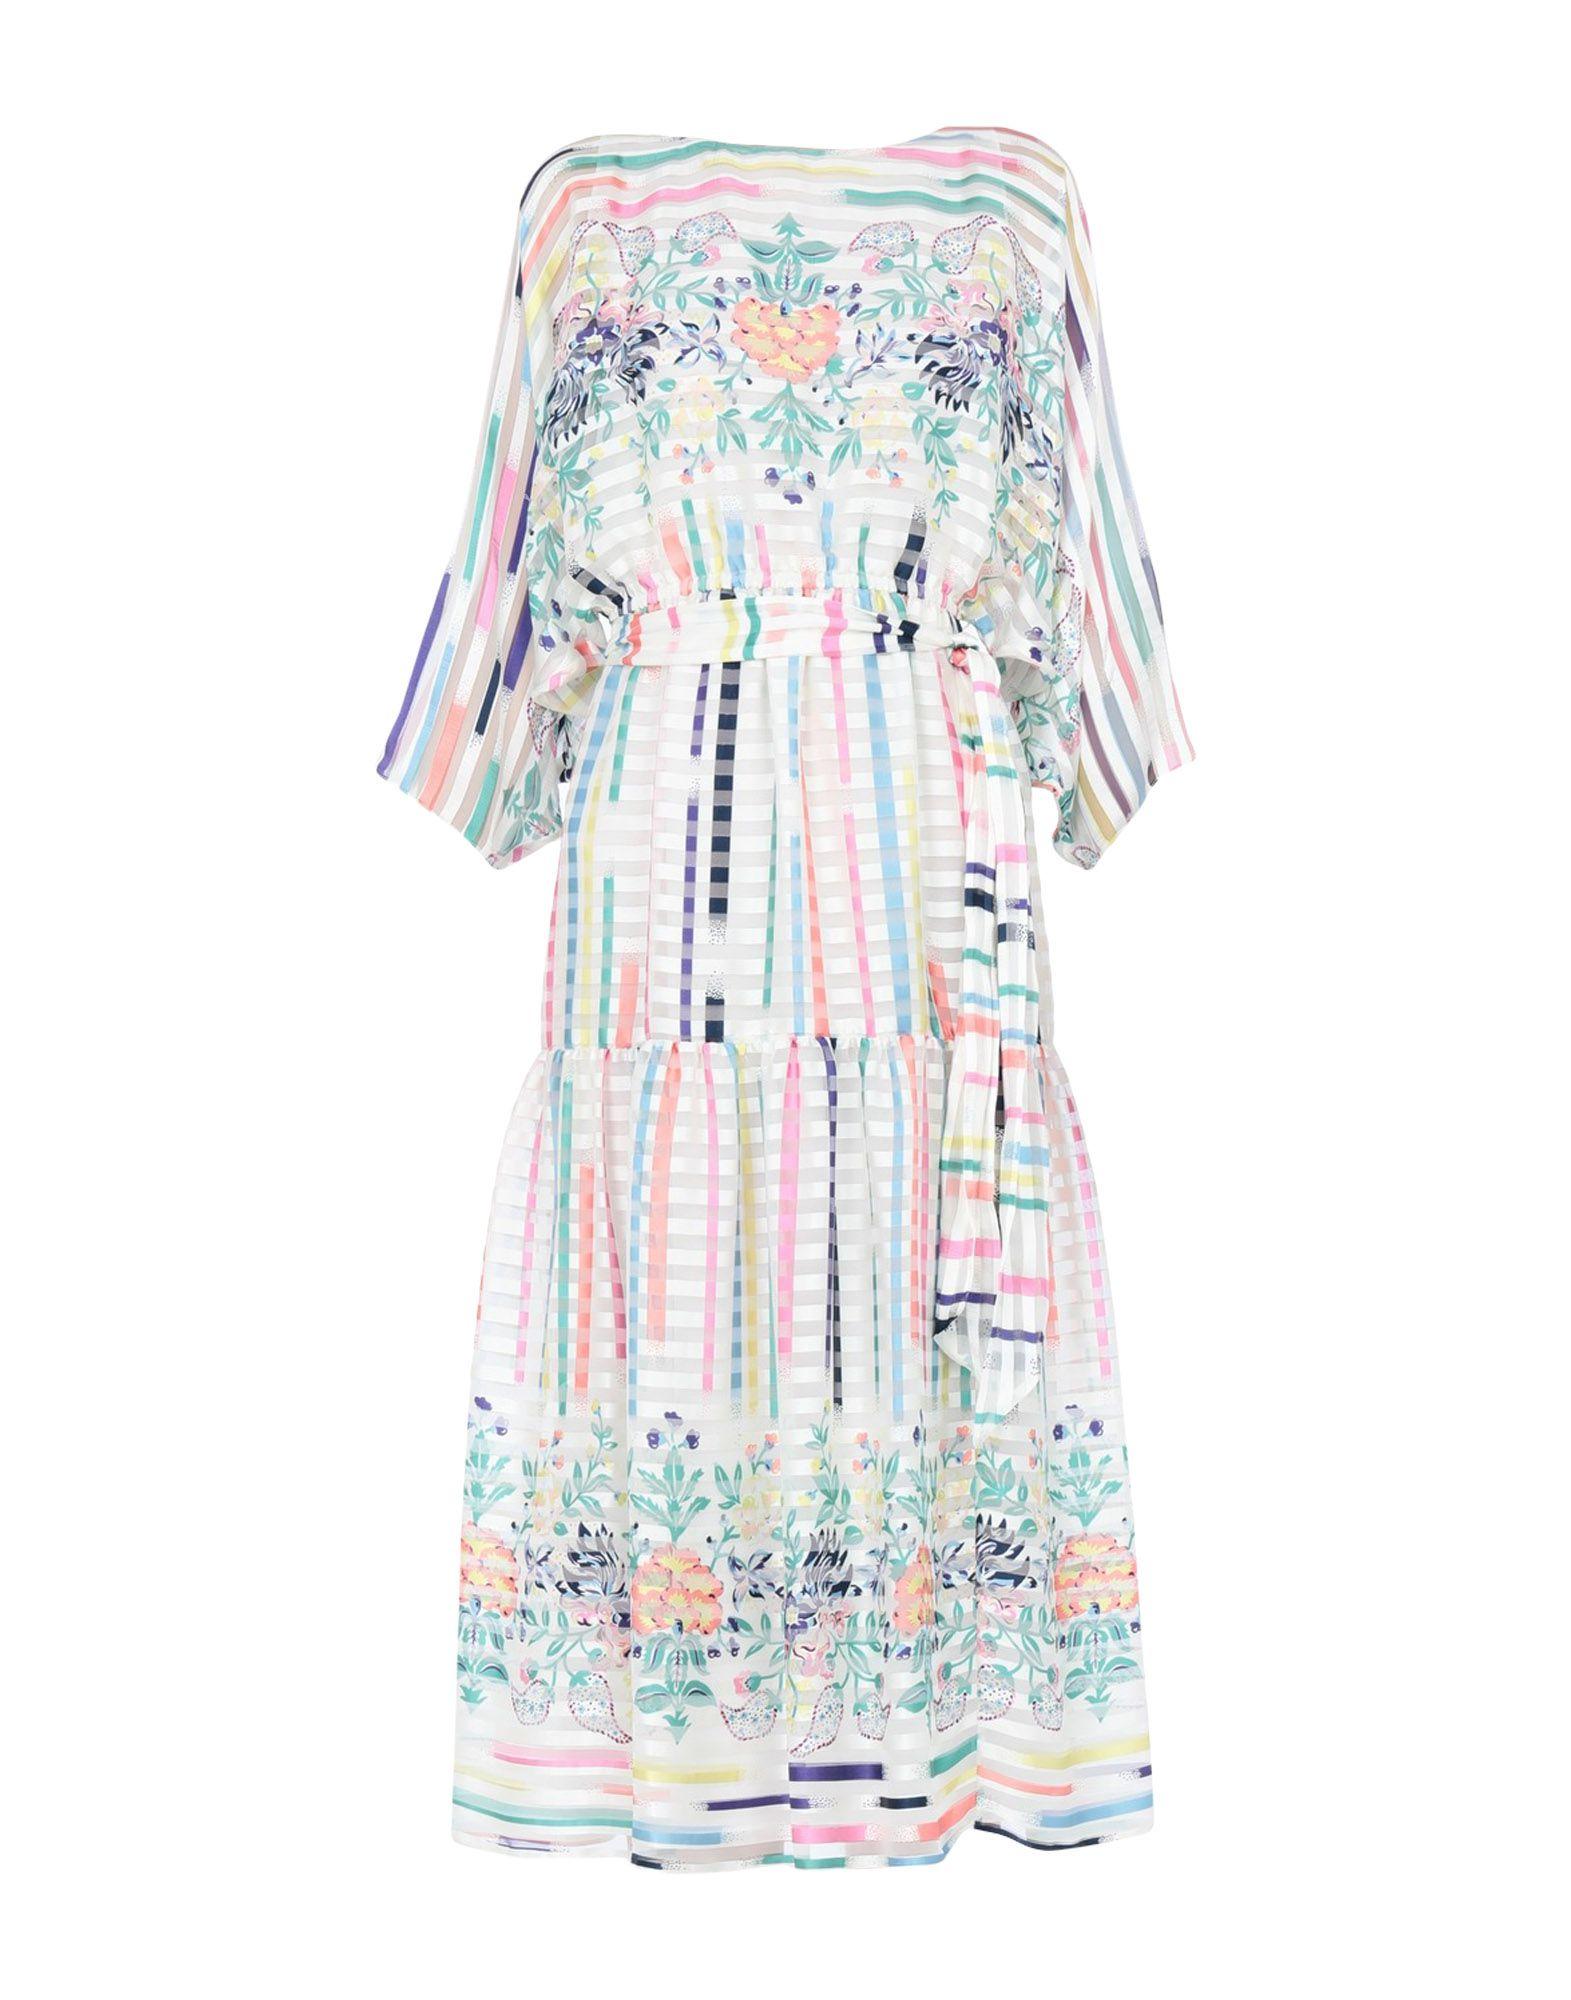 VILSHENKO Платье длиной 3/4 icons платье длиной 3 4